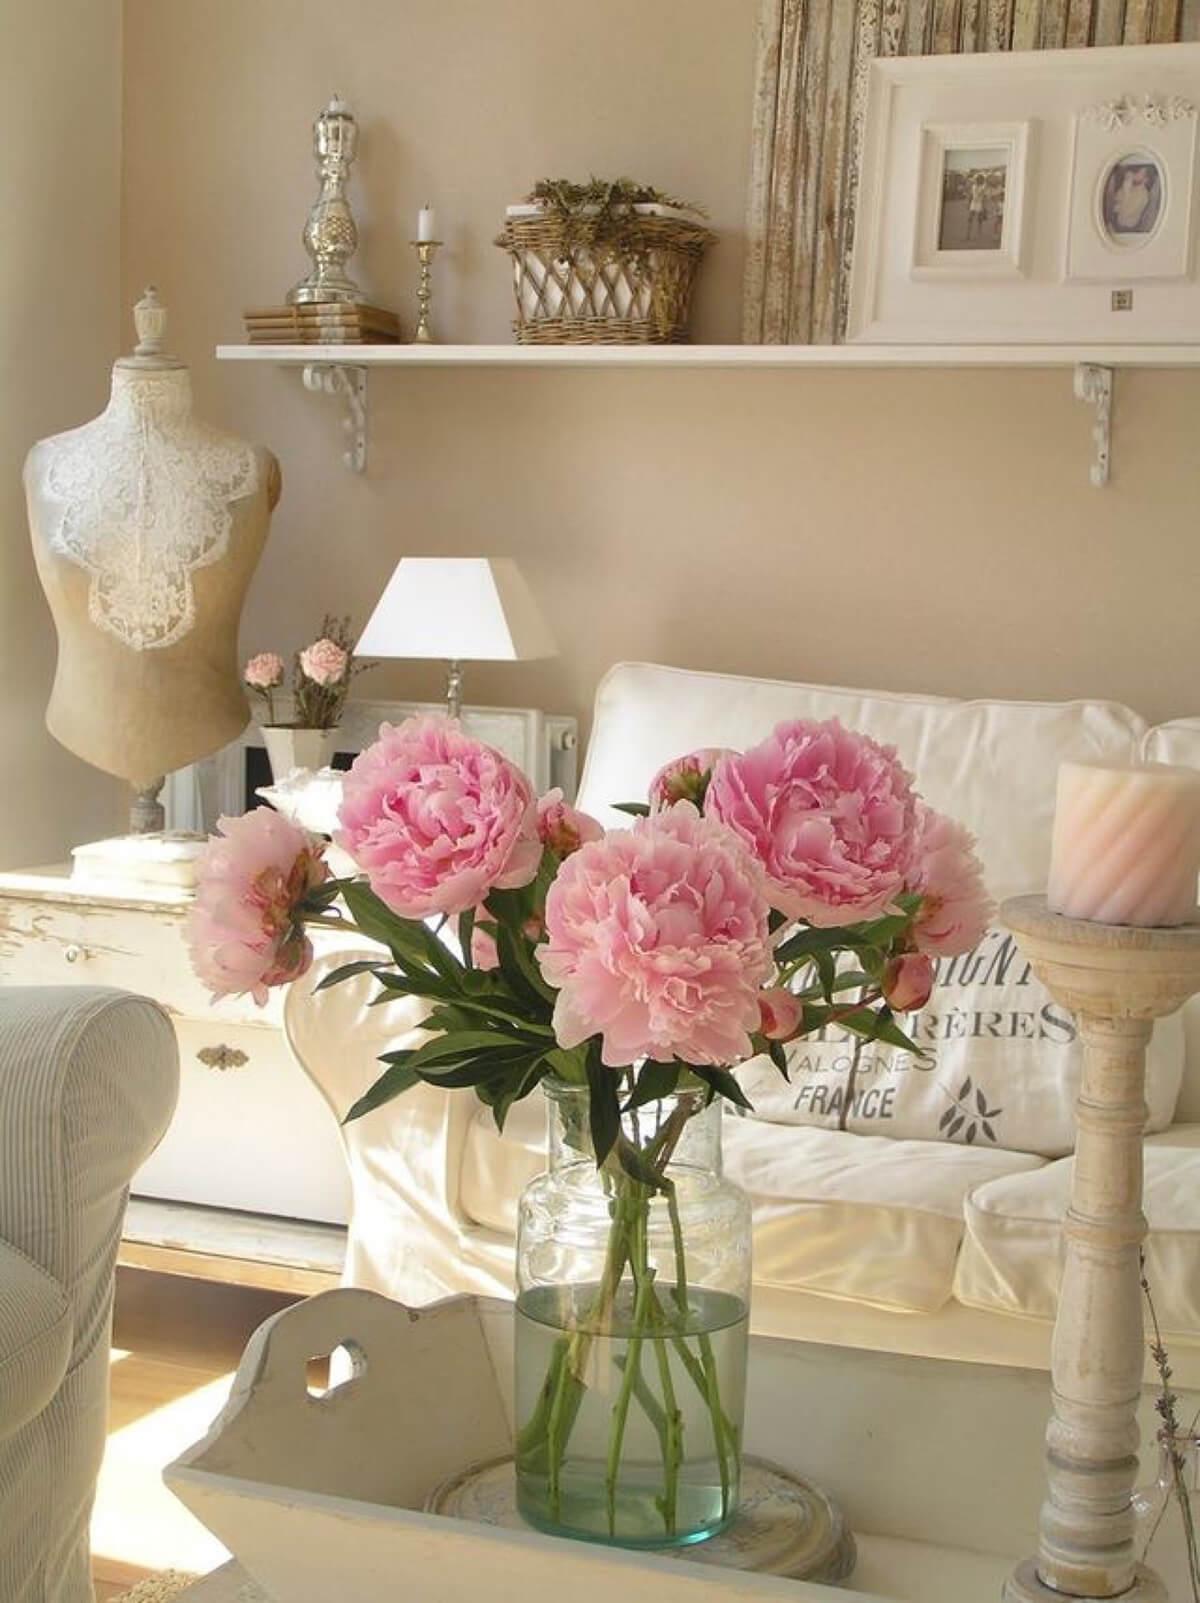 Dainty Arrangement with Pink Peonies